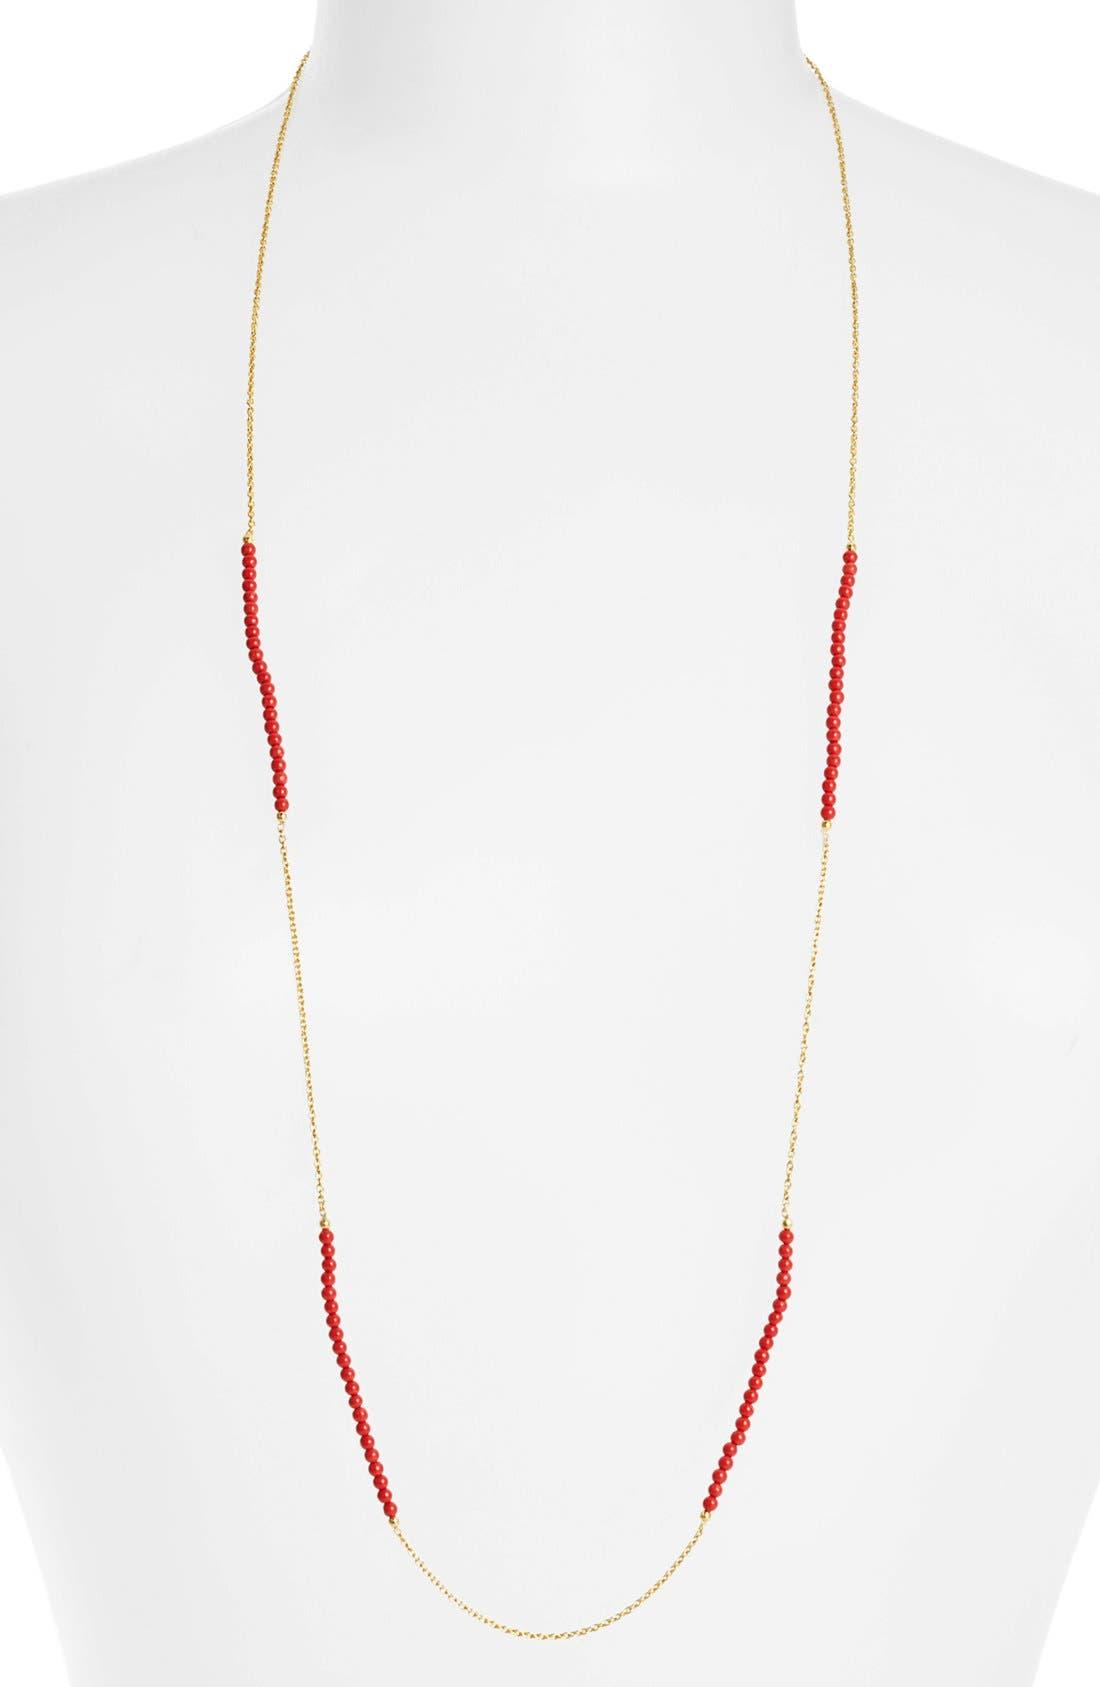 Main Image - Argento Vivo Long Bead & Link Necklace